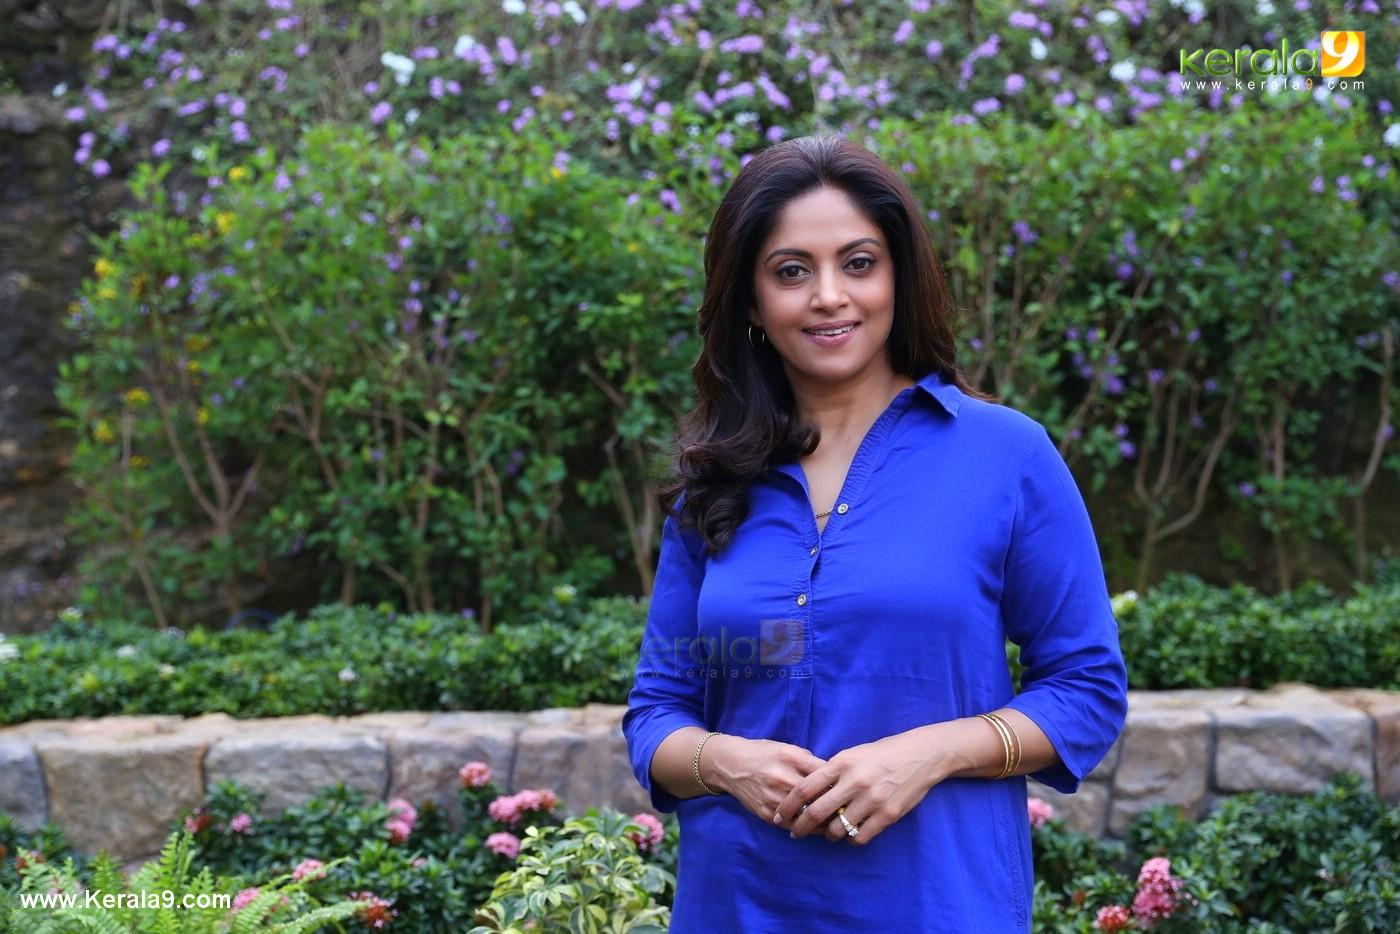 nadia moidu in neerali malayalam movie images 0923 2